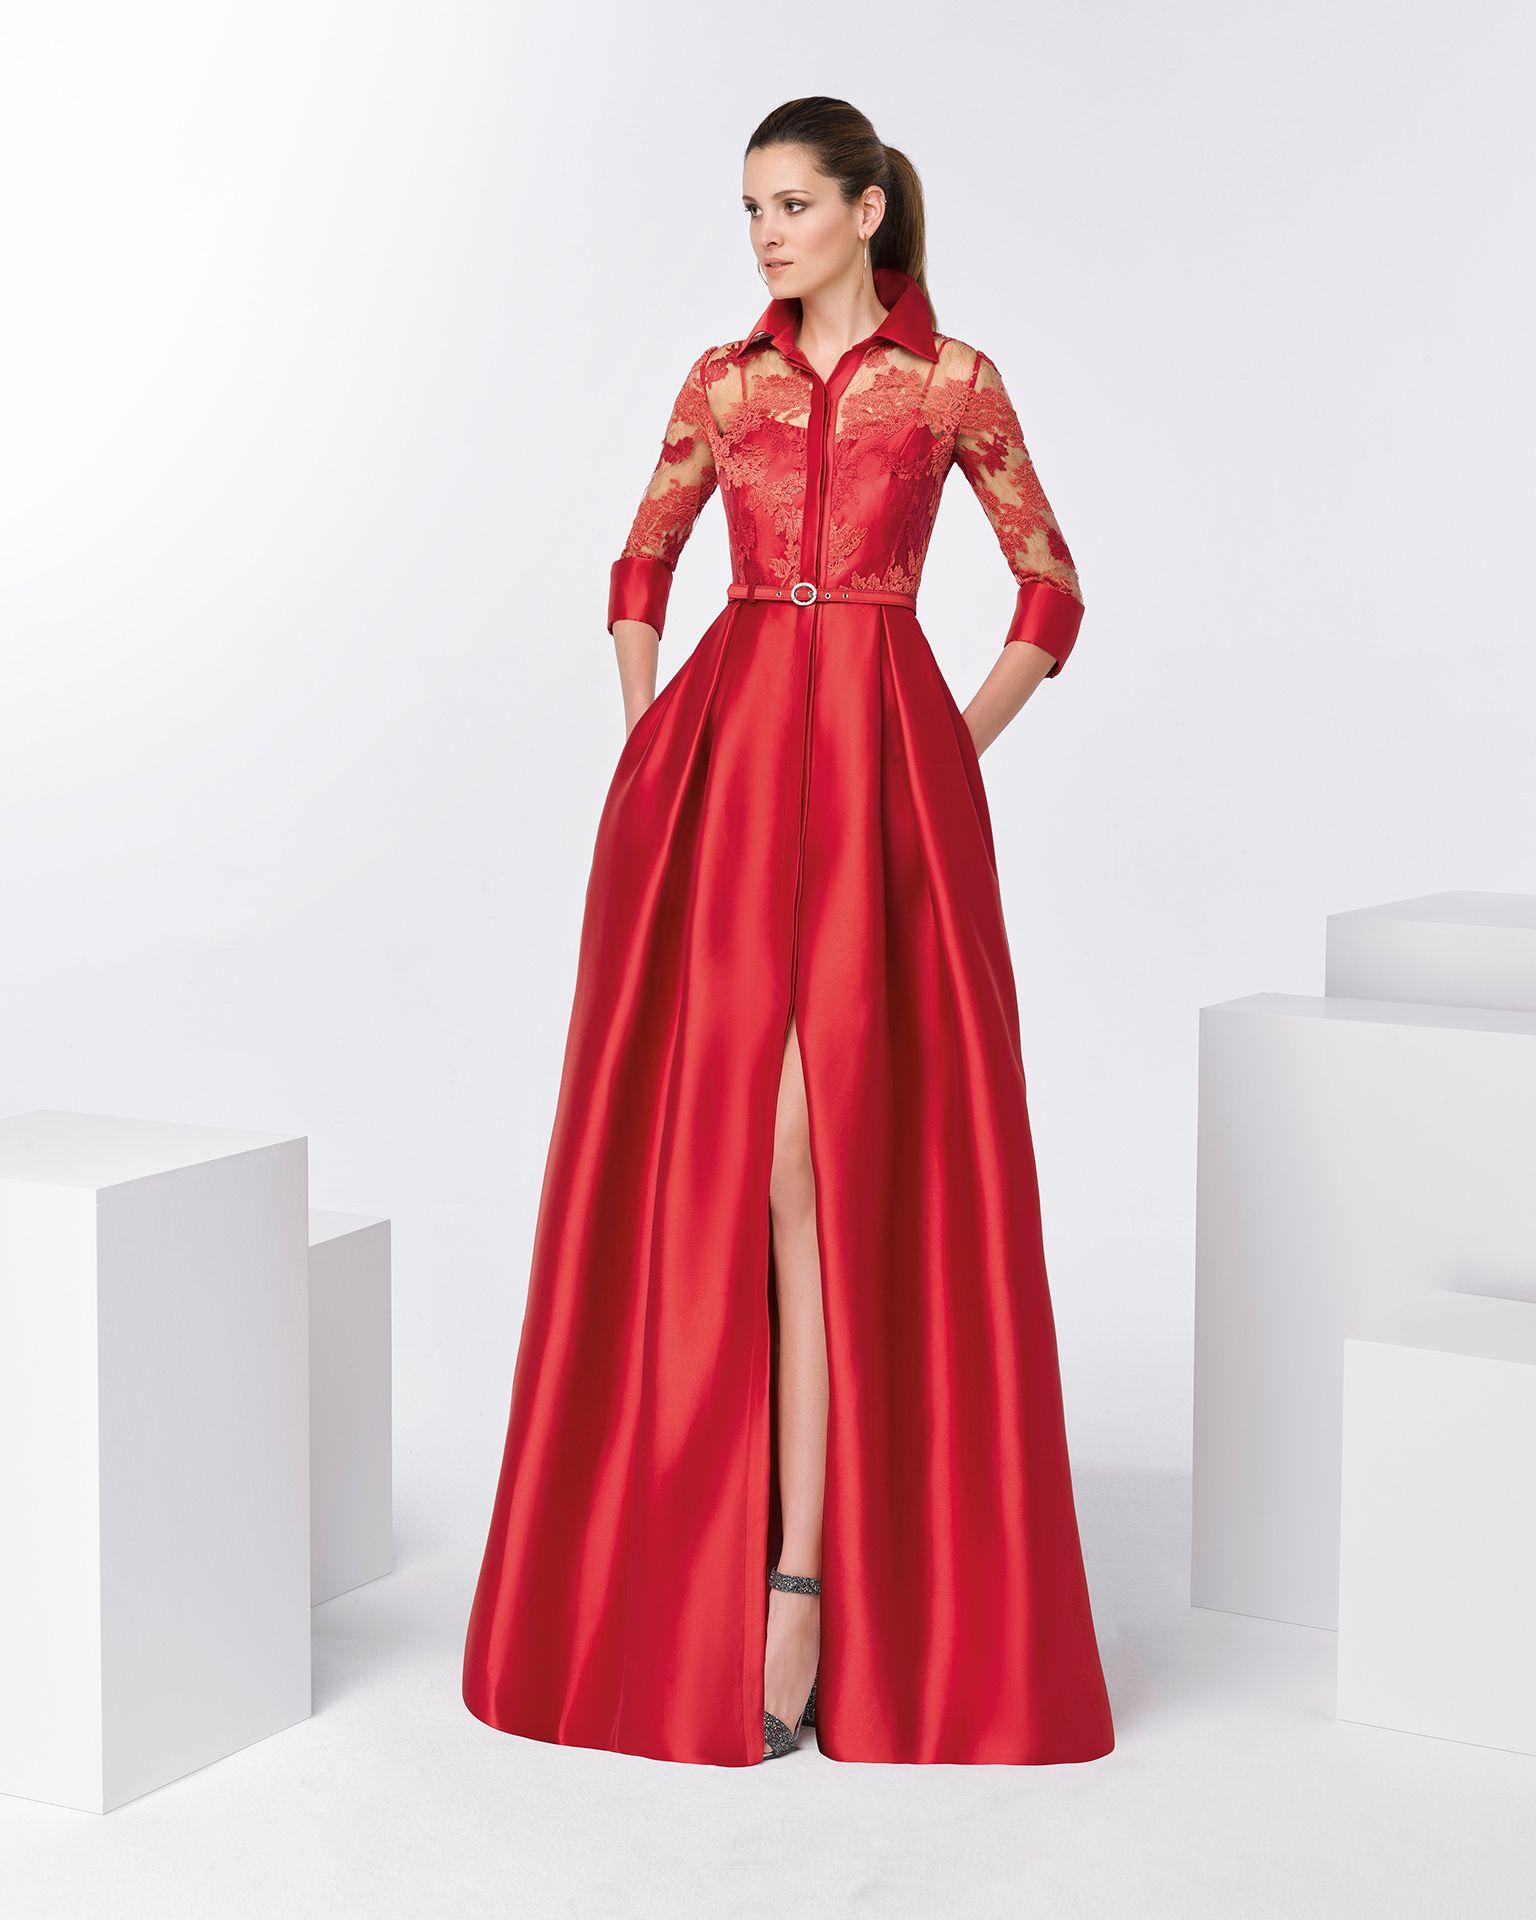 8e4f6a0b1 Vestido camisero fiesta - Vestidos elegantes de españa